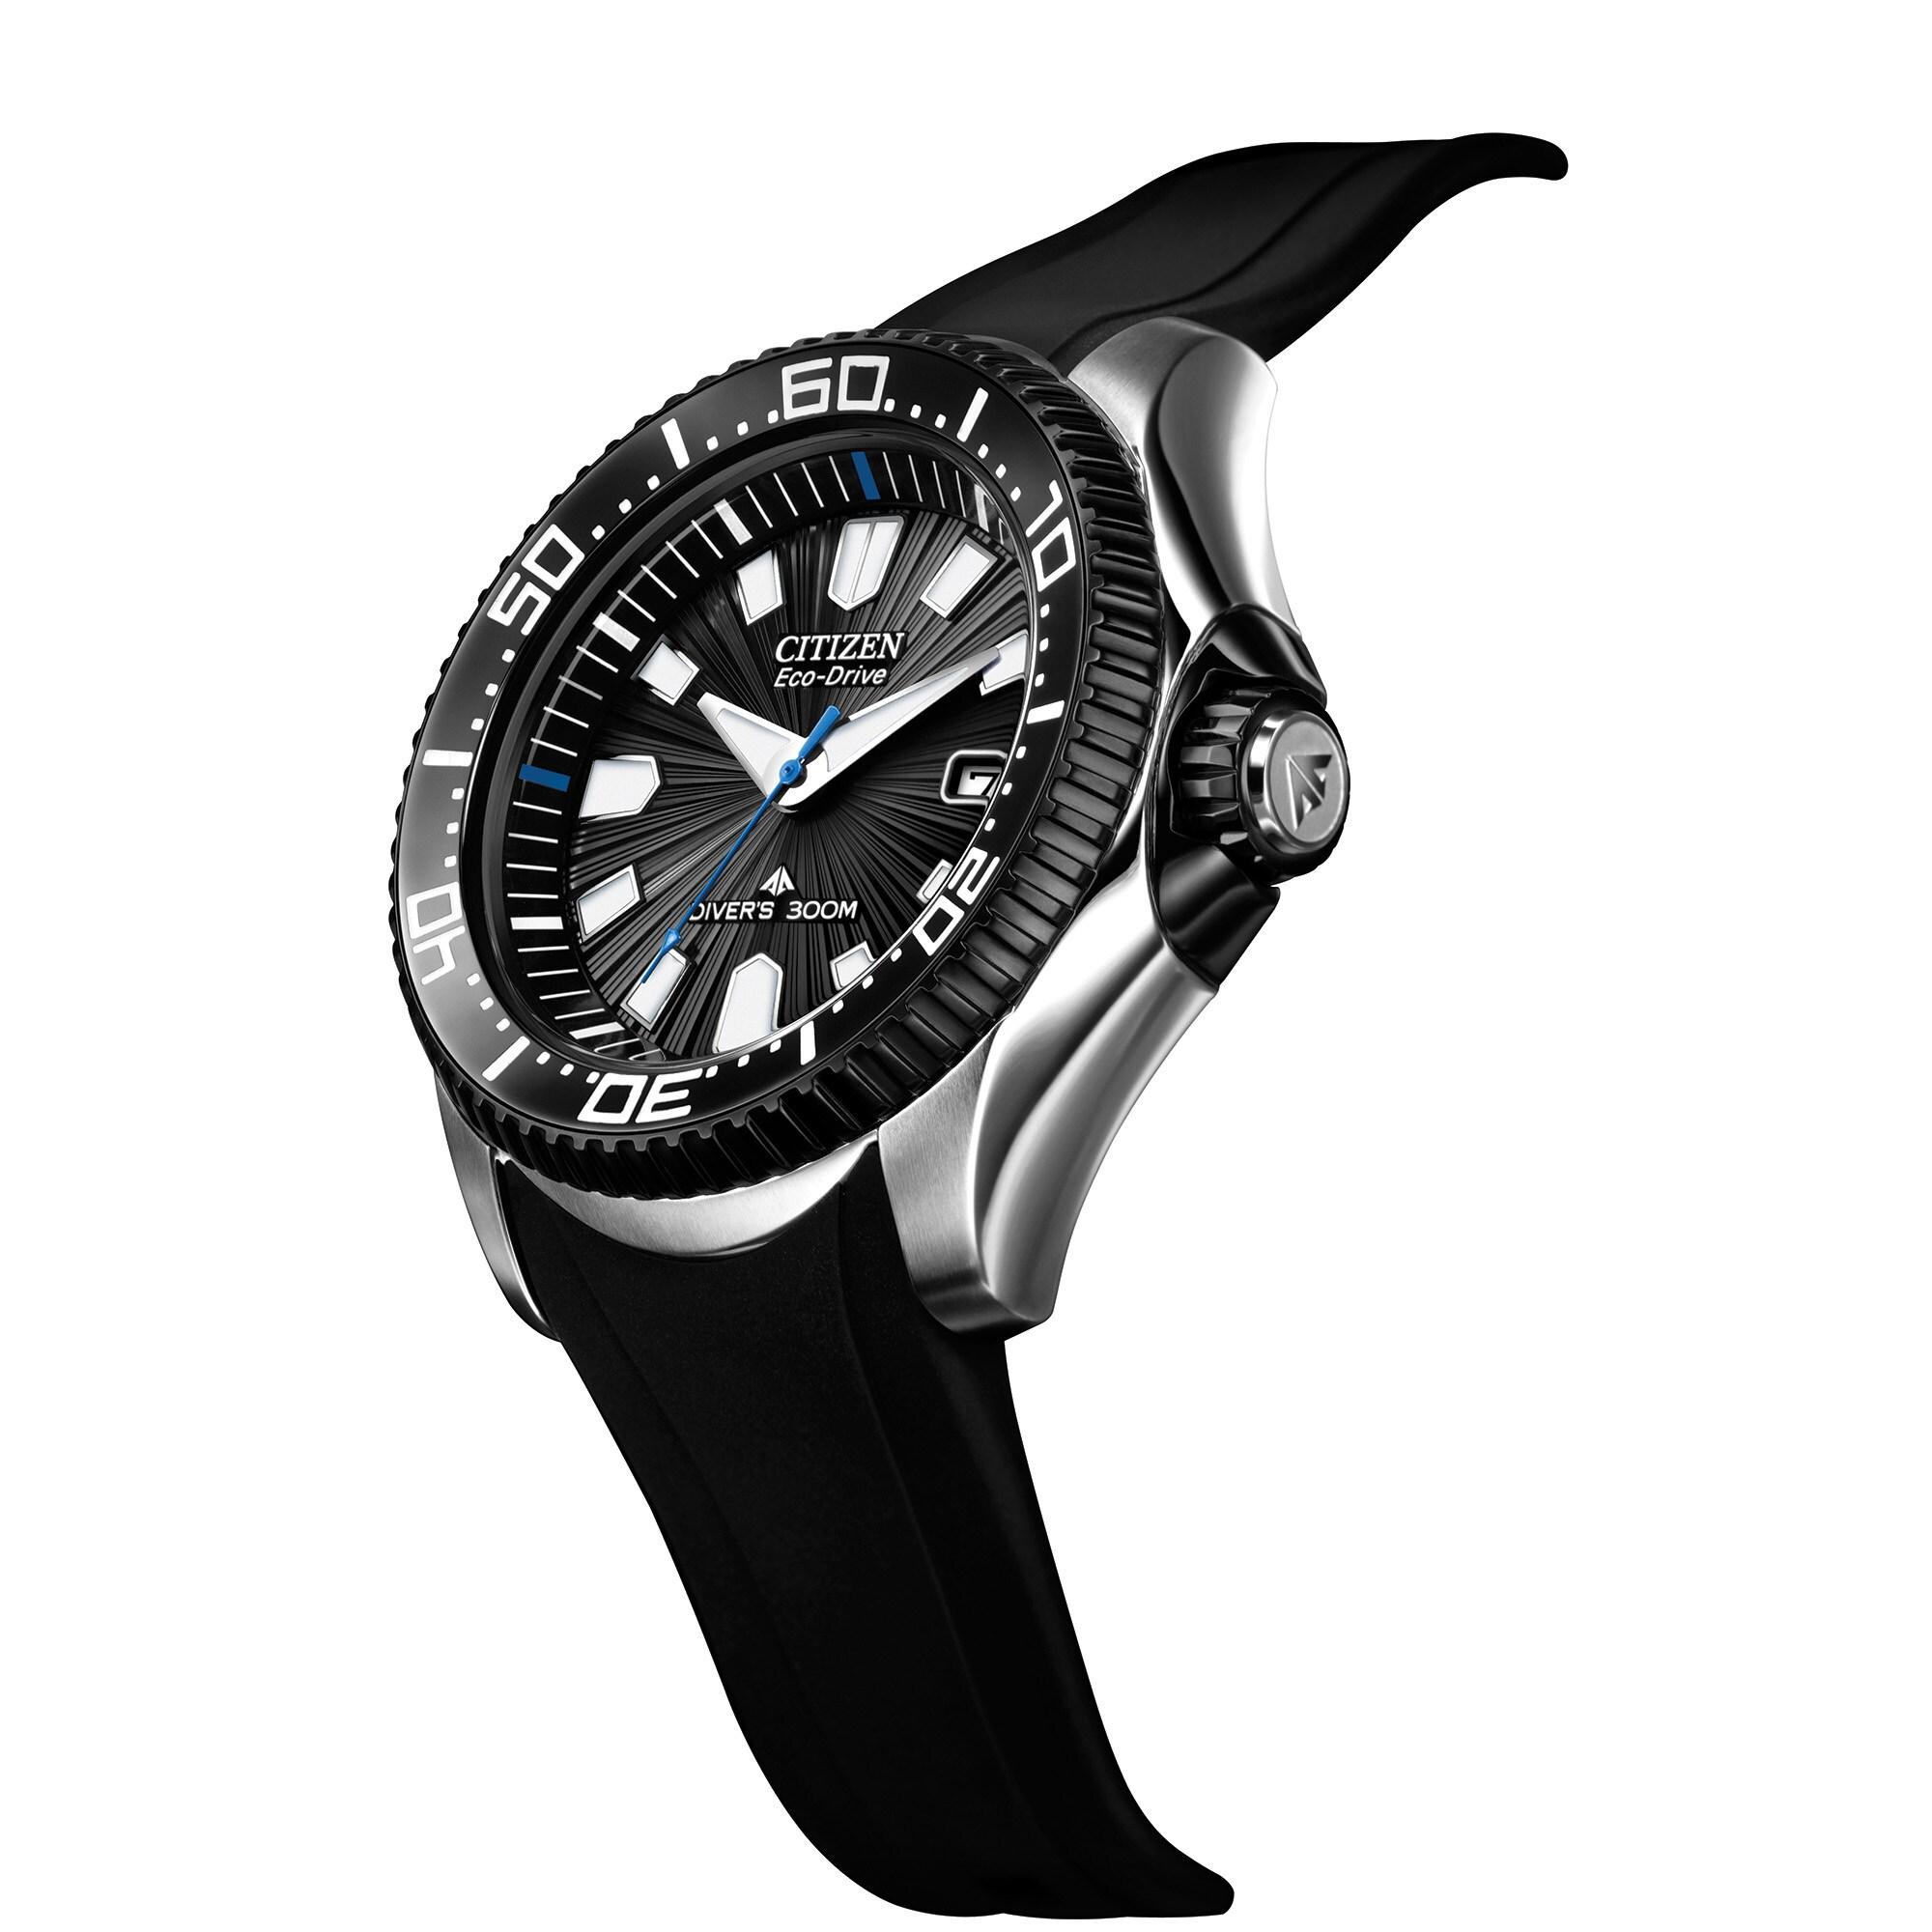 Citizen Men's BN0085-01E Eco-Drive Promaster Diver Watch ...